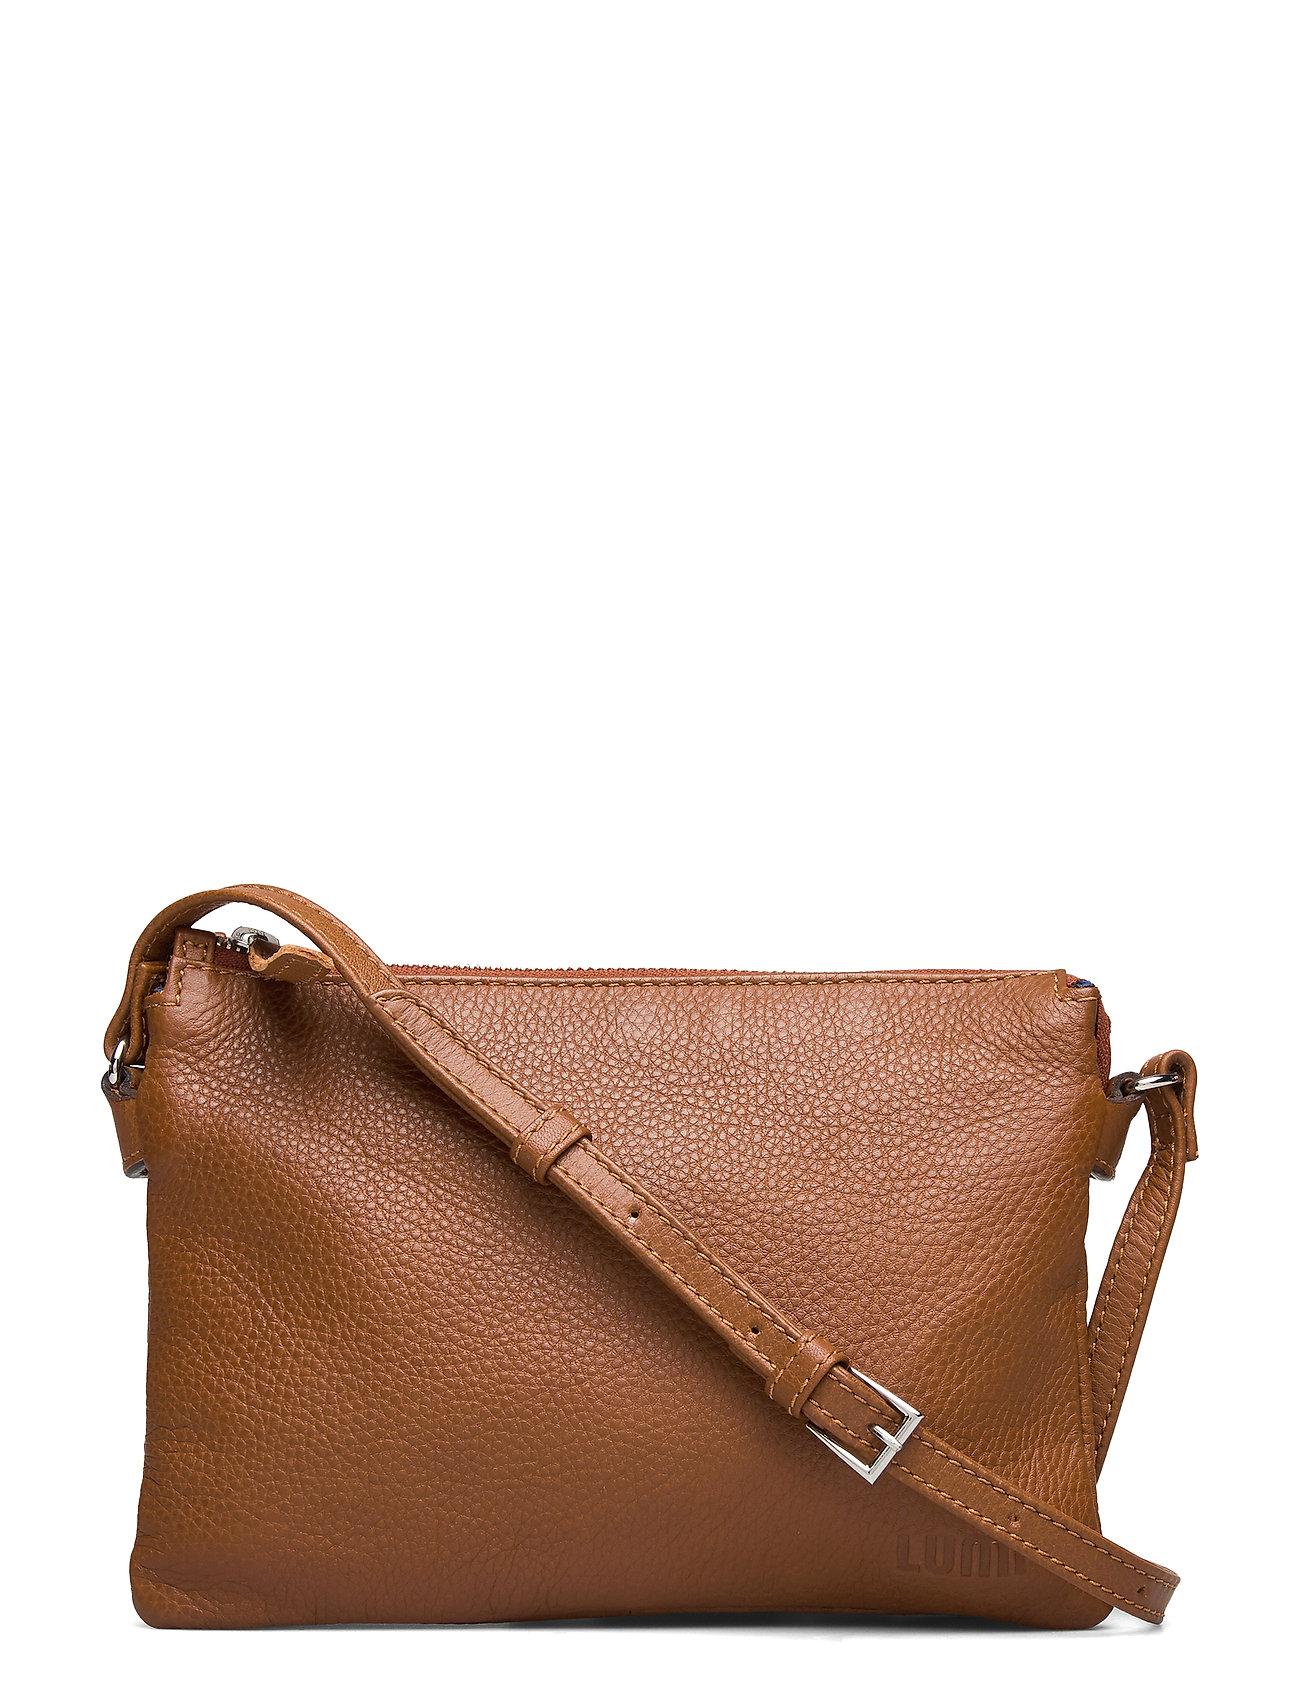 Image of Pirta Large Crossbody Pouch Bags Small Shoulder Bags - Crossbody Bags Brun LUMI (3378177629)